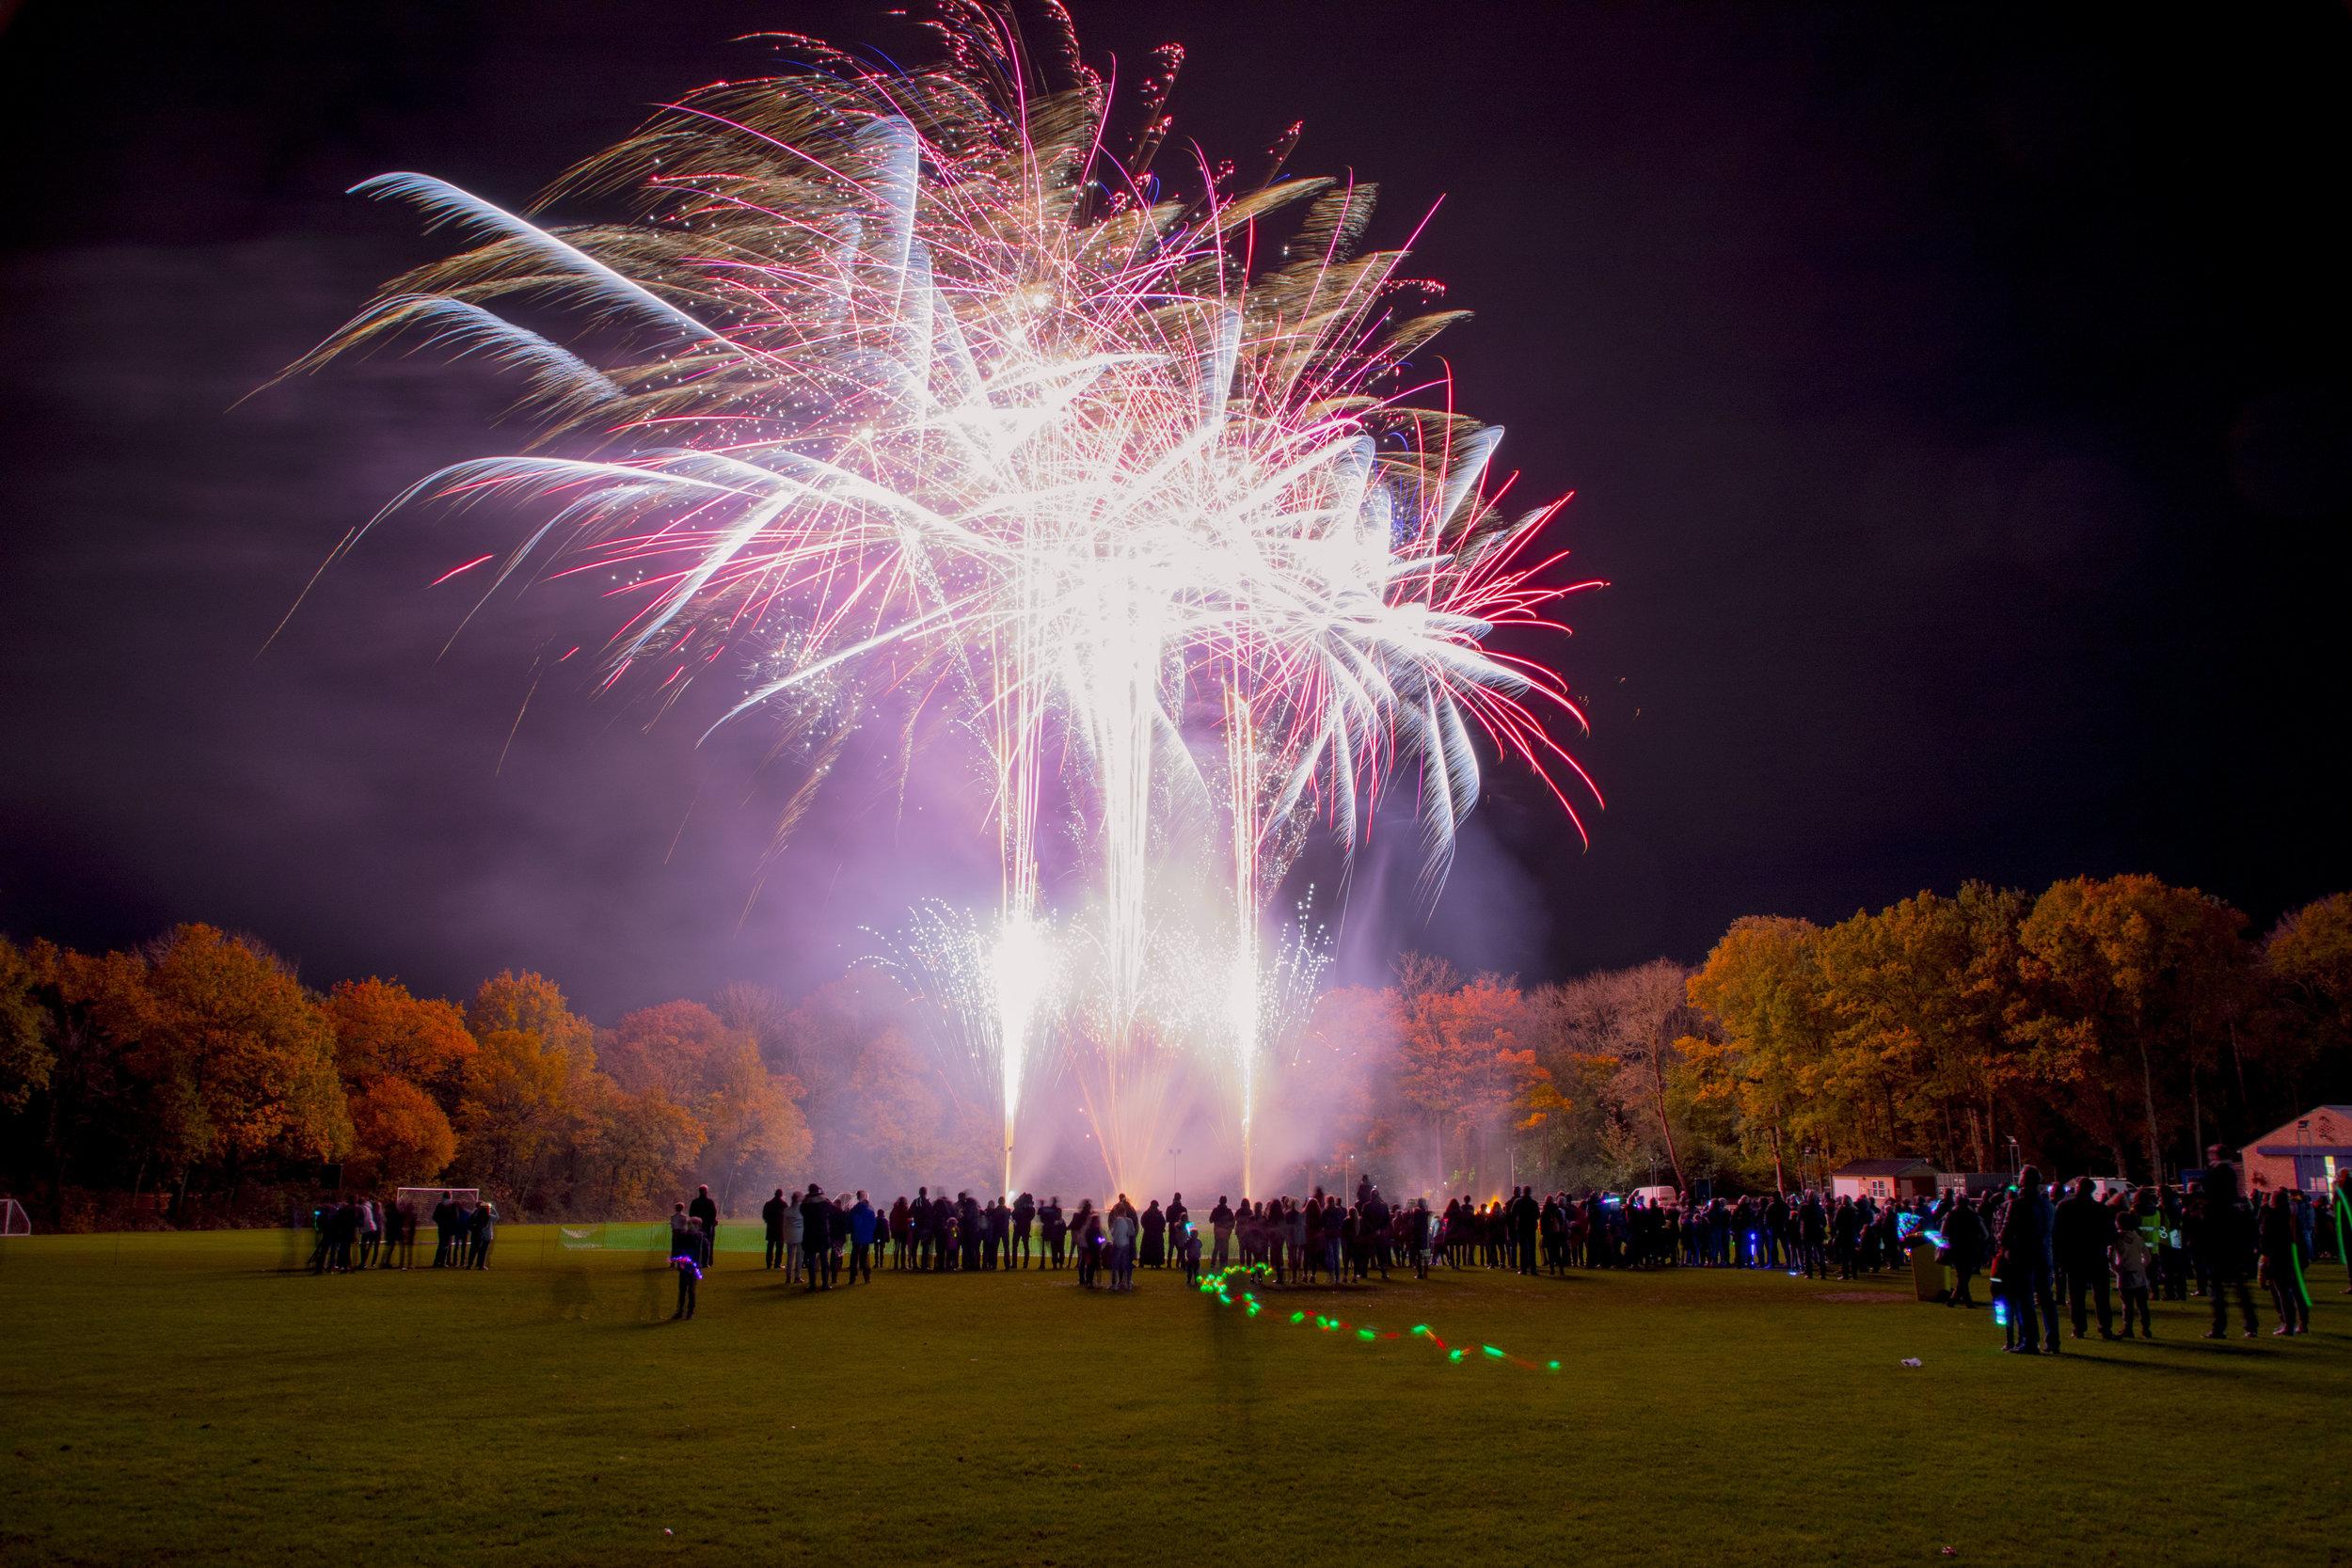 Stunning fireworks at a school fundraiser.